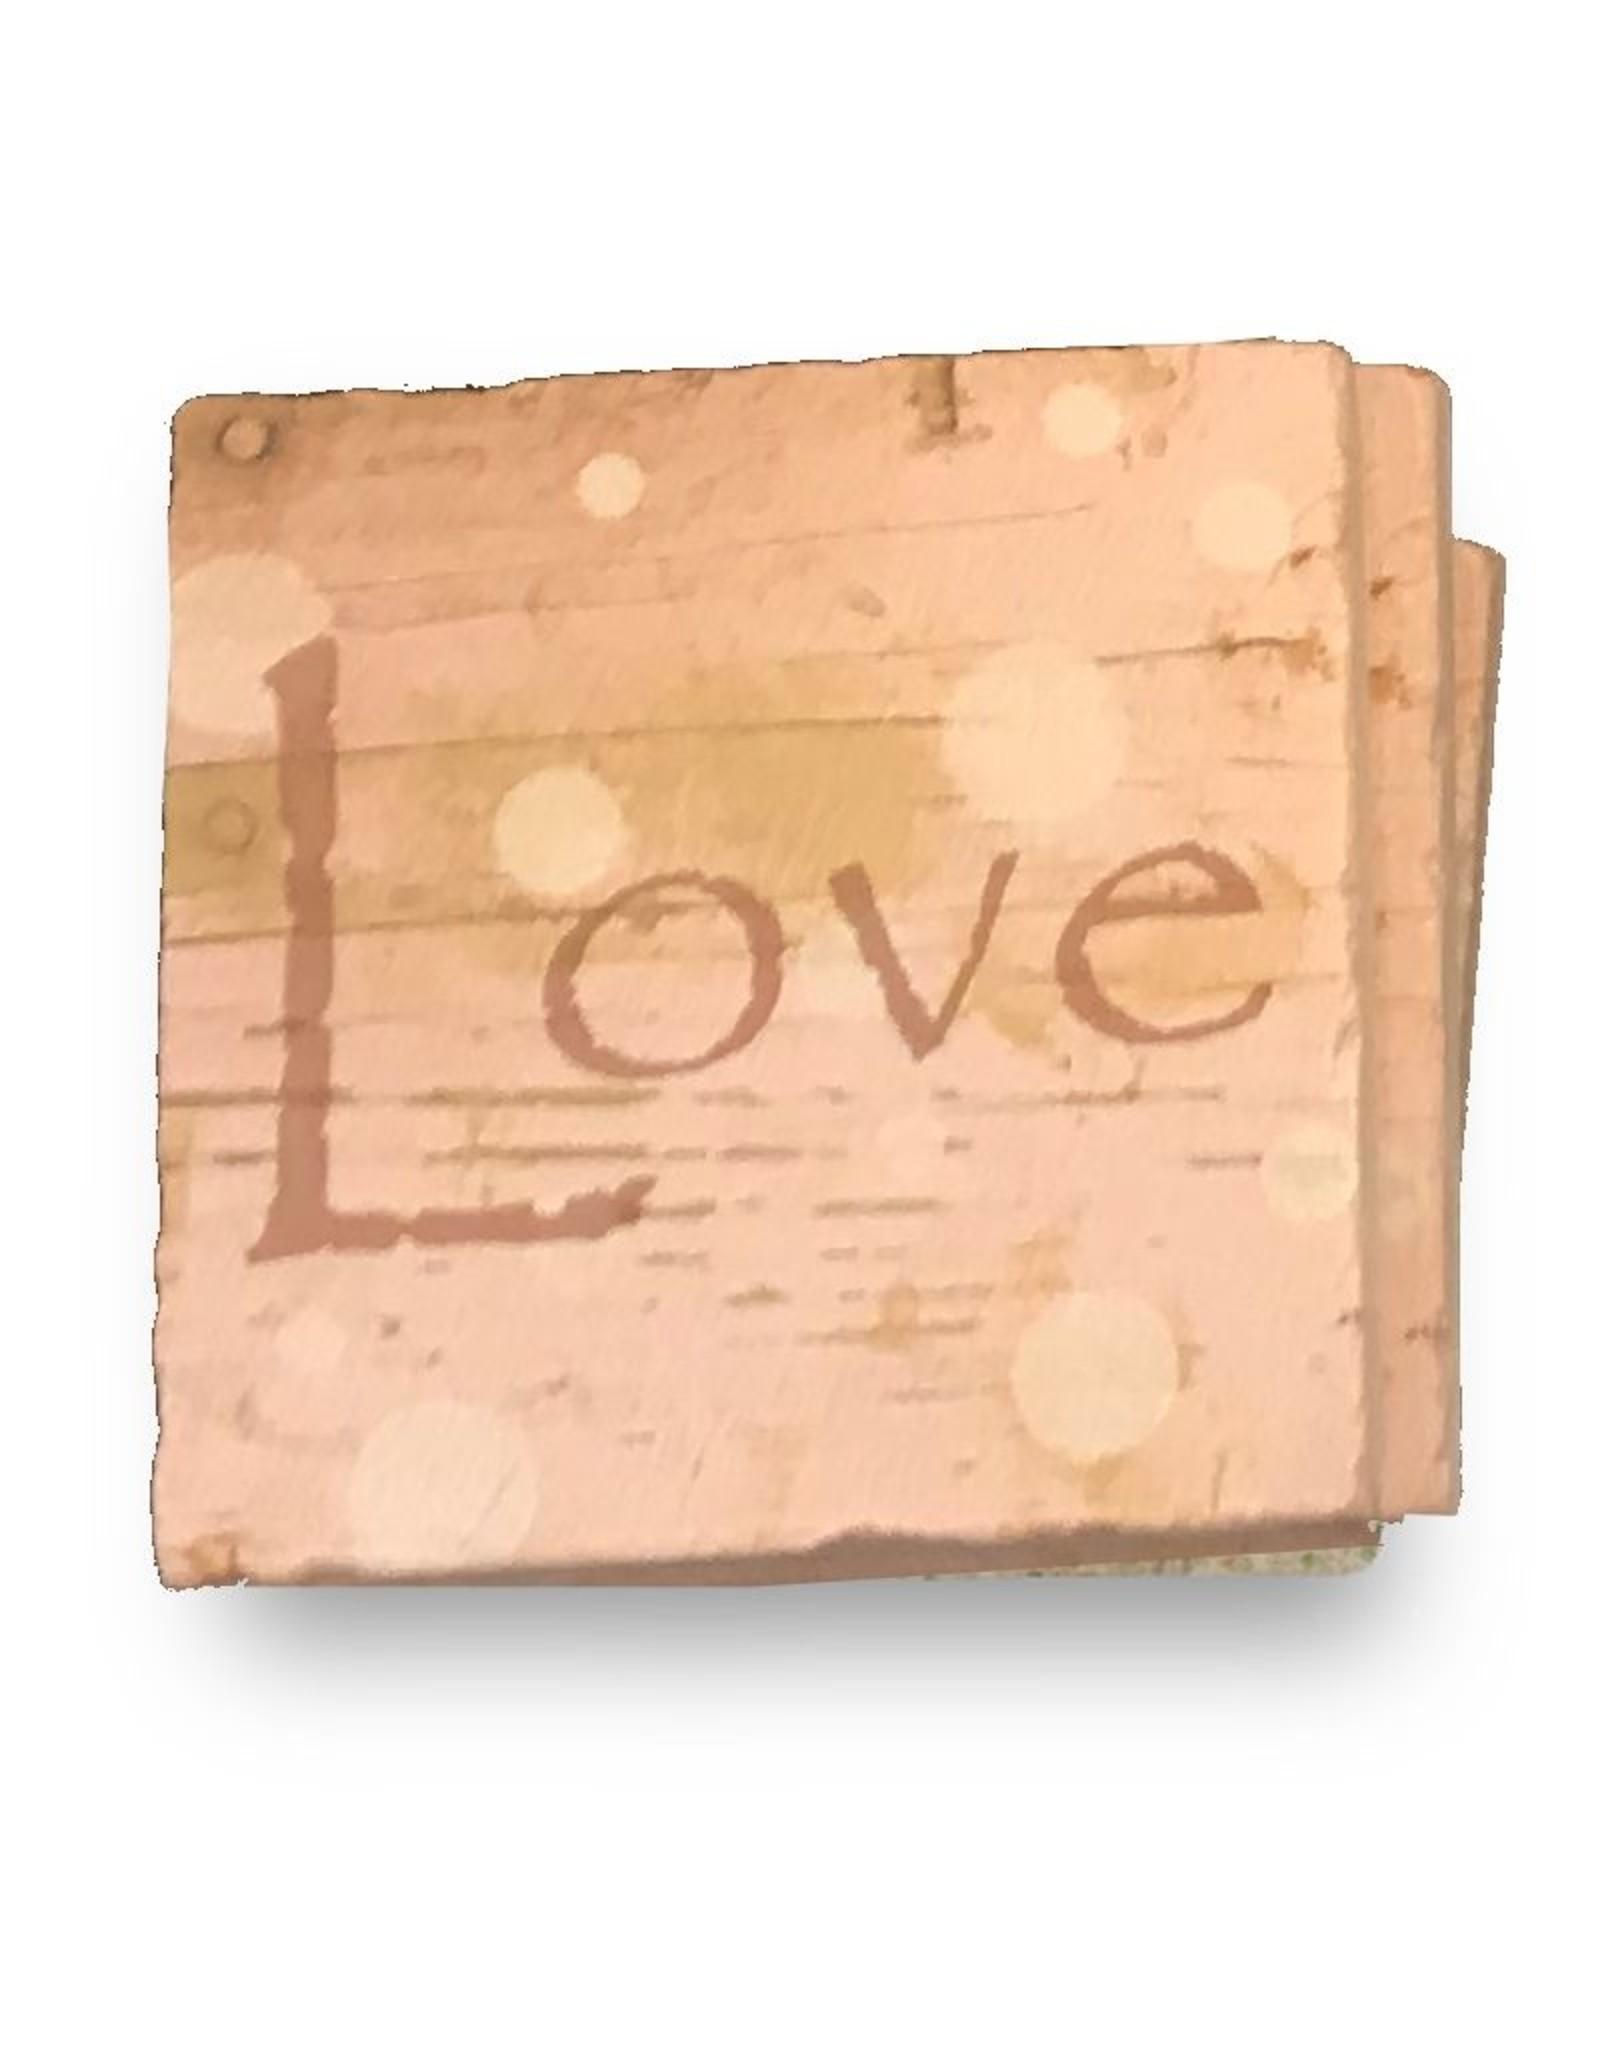 Paisley and Parsley Stone Coaster, Love